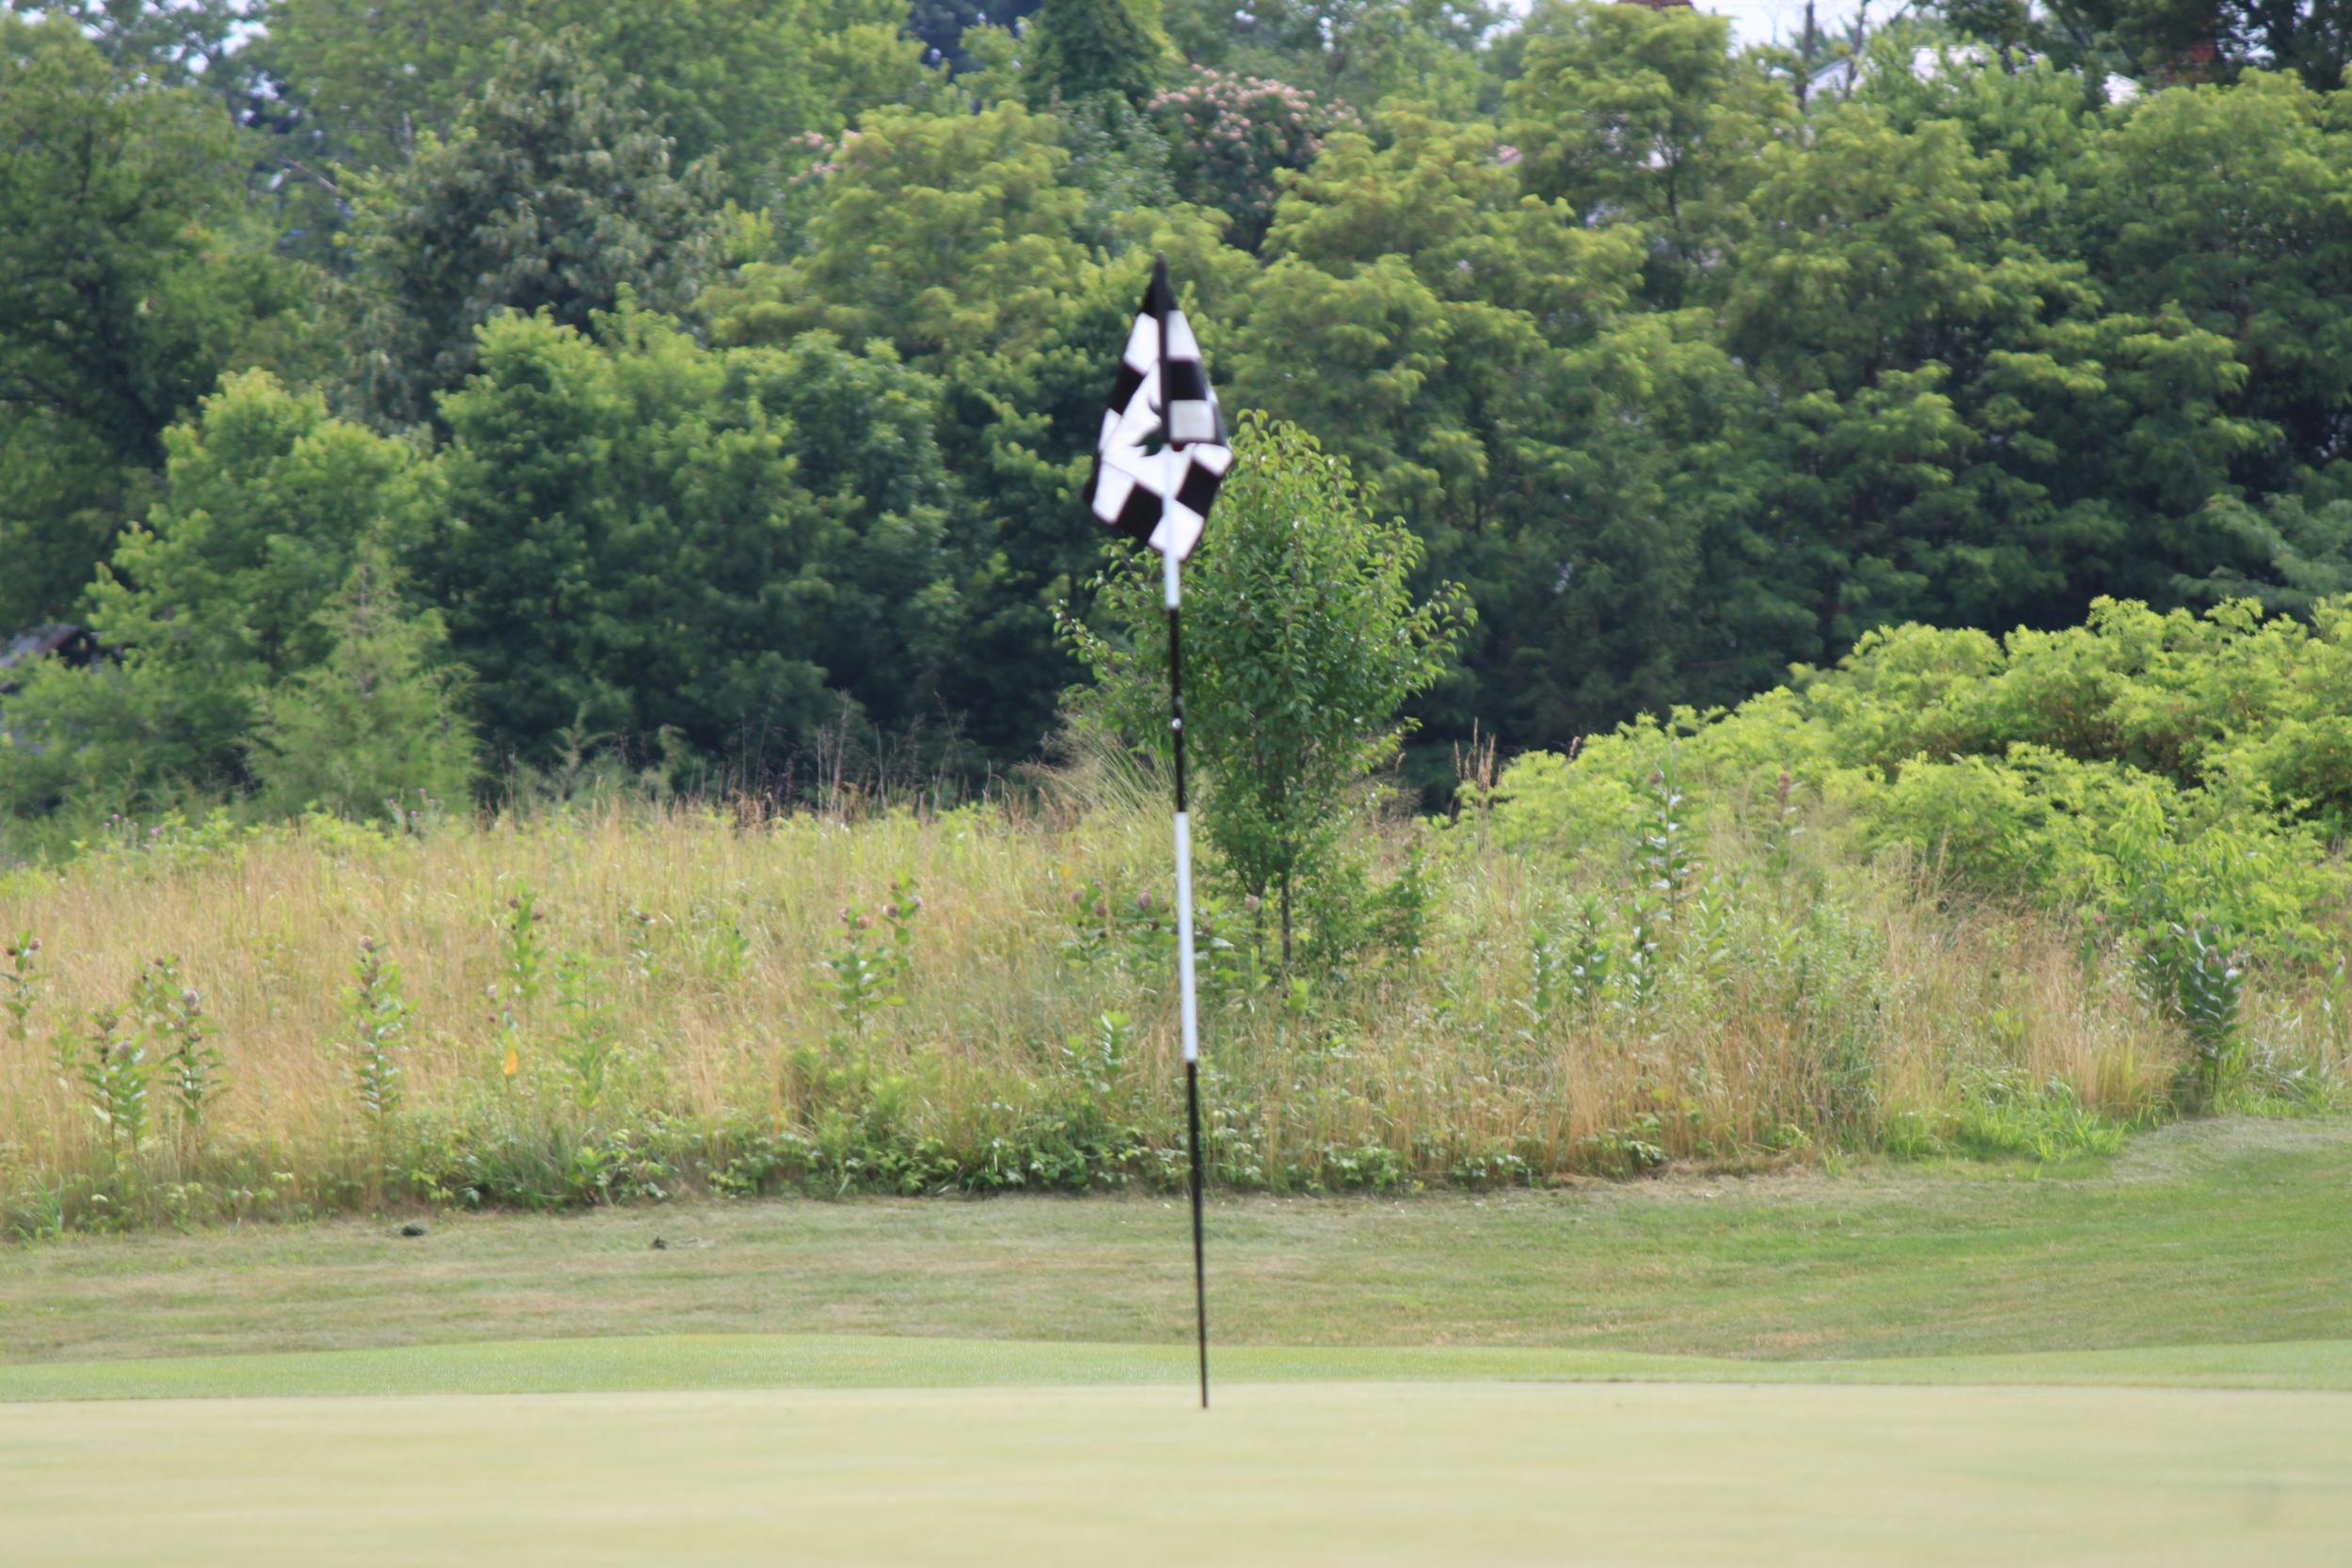 Dennis_Fitzgerald_Golf_Tournament_2011_IMG_3451.JPG